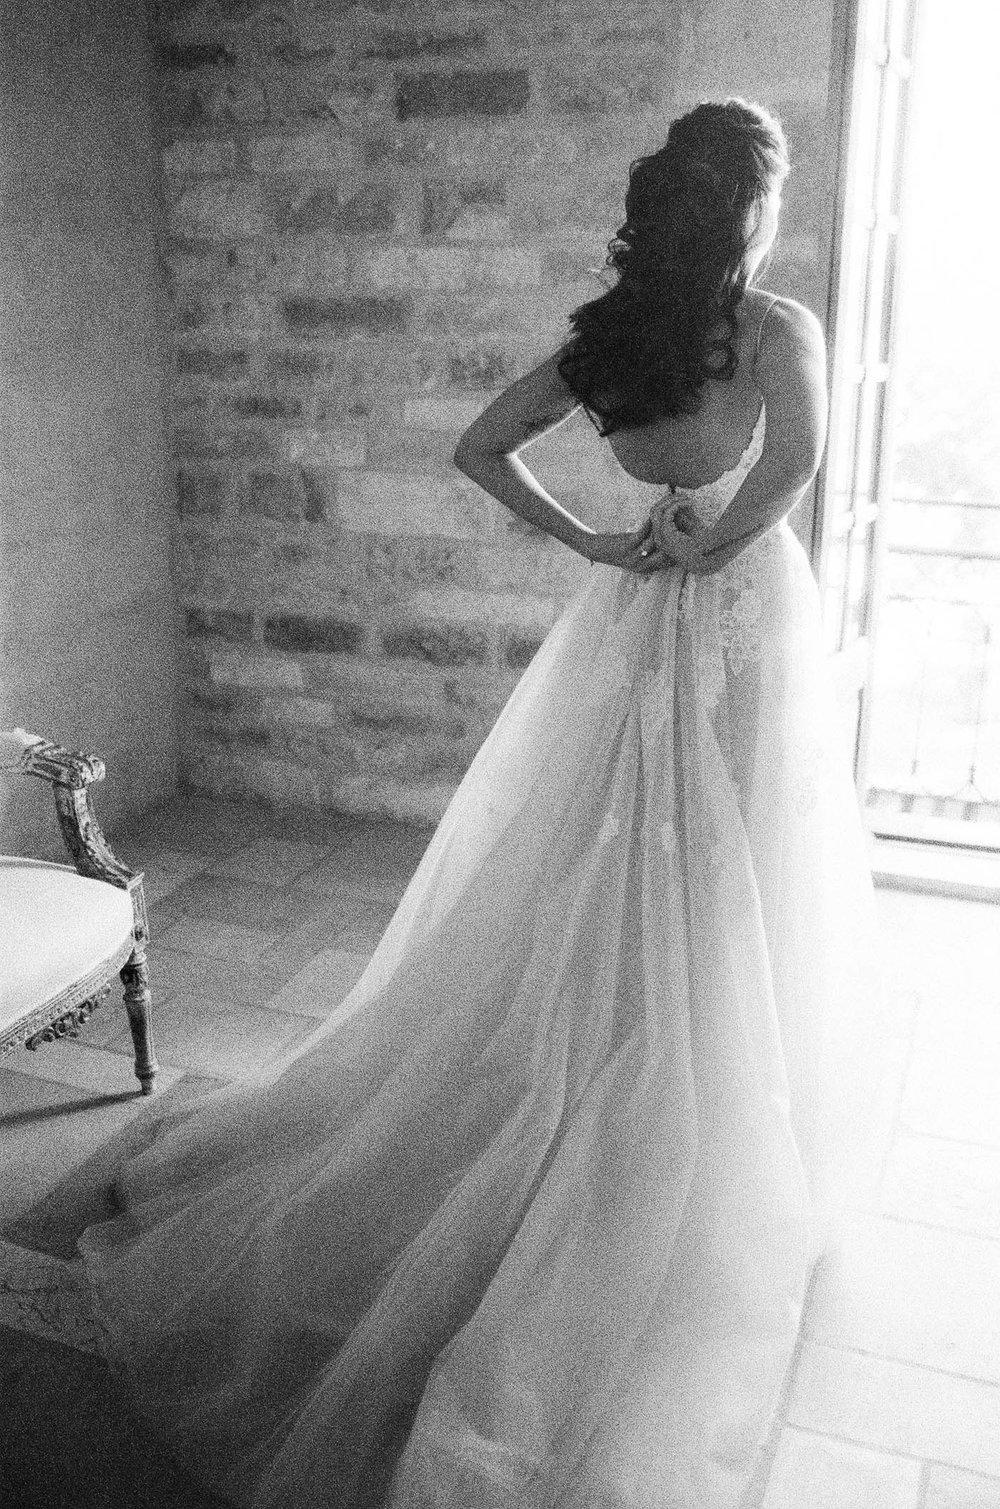 sunstone-villa-wedding-3-Jen_Huang-RD-17-Jen_Huang-000010440002.jpg